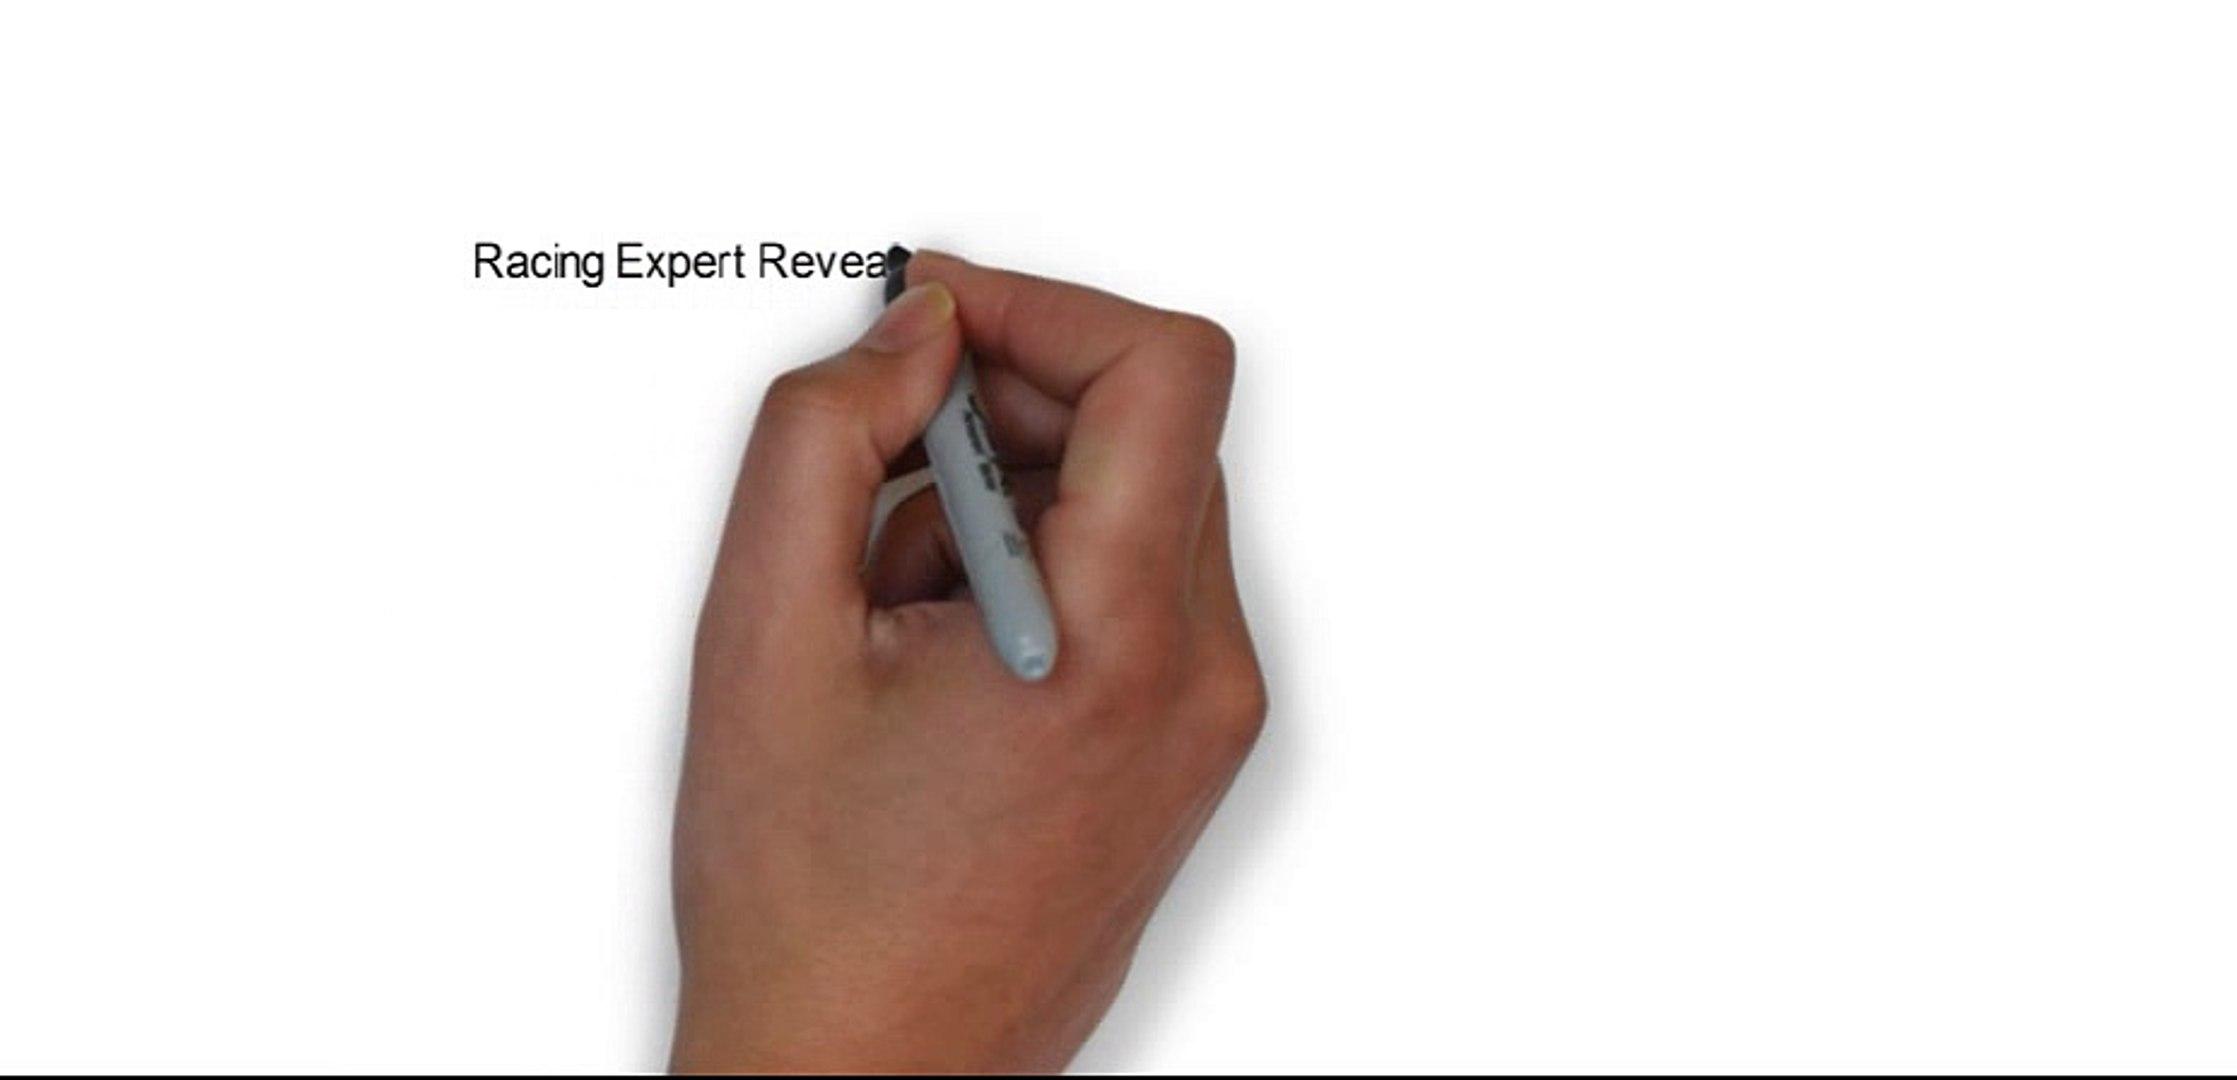 Racing Expert - New Horse Racing Tipster